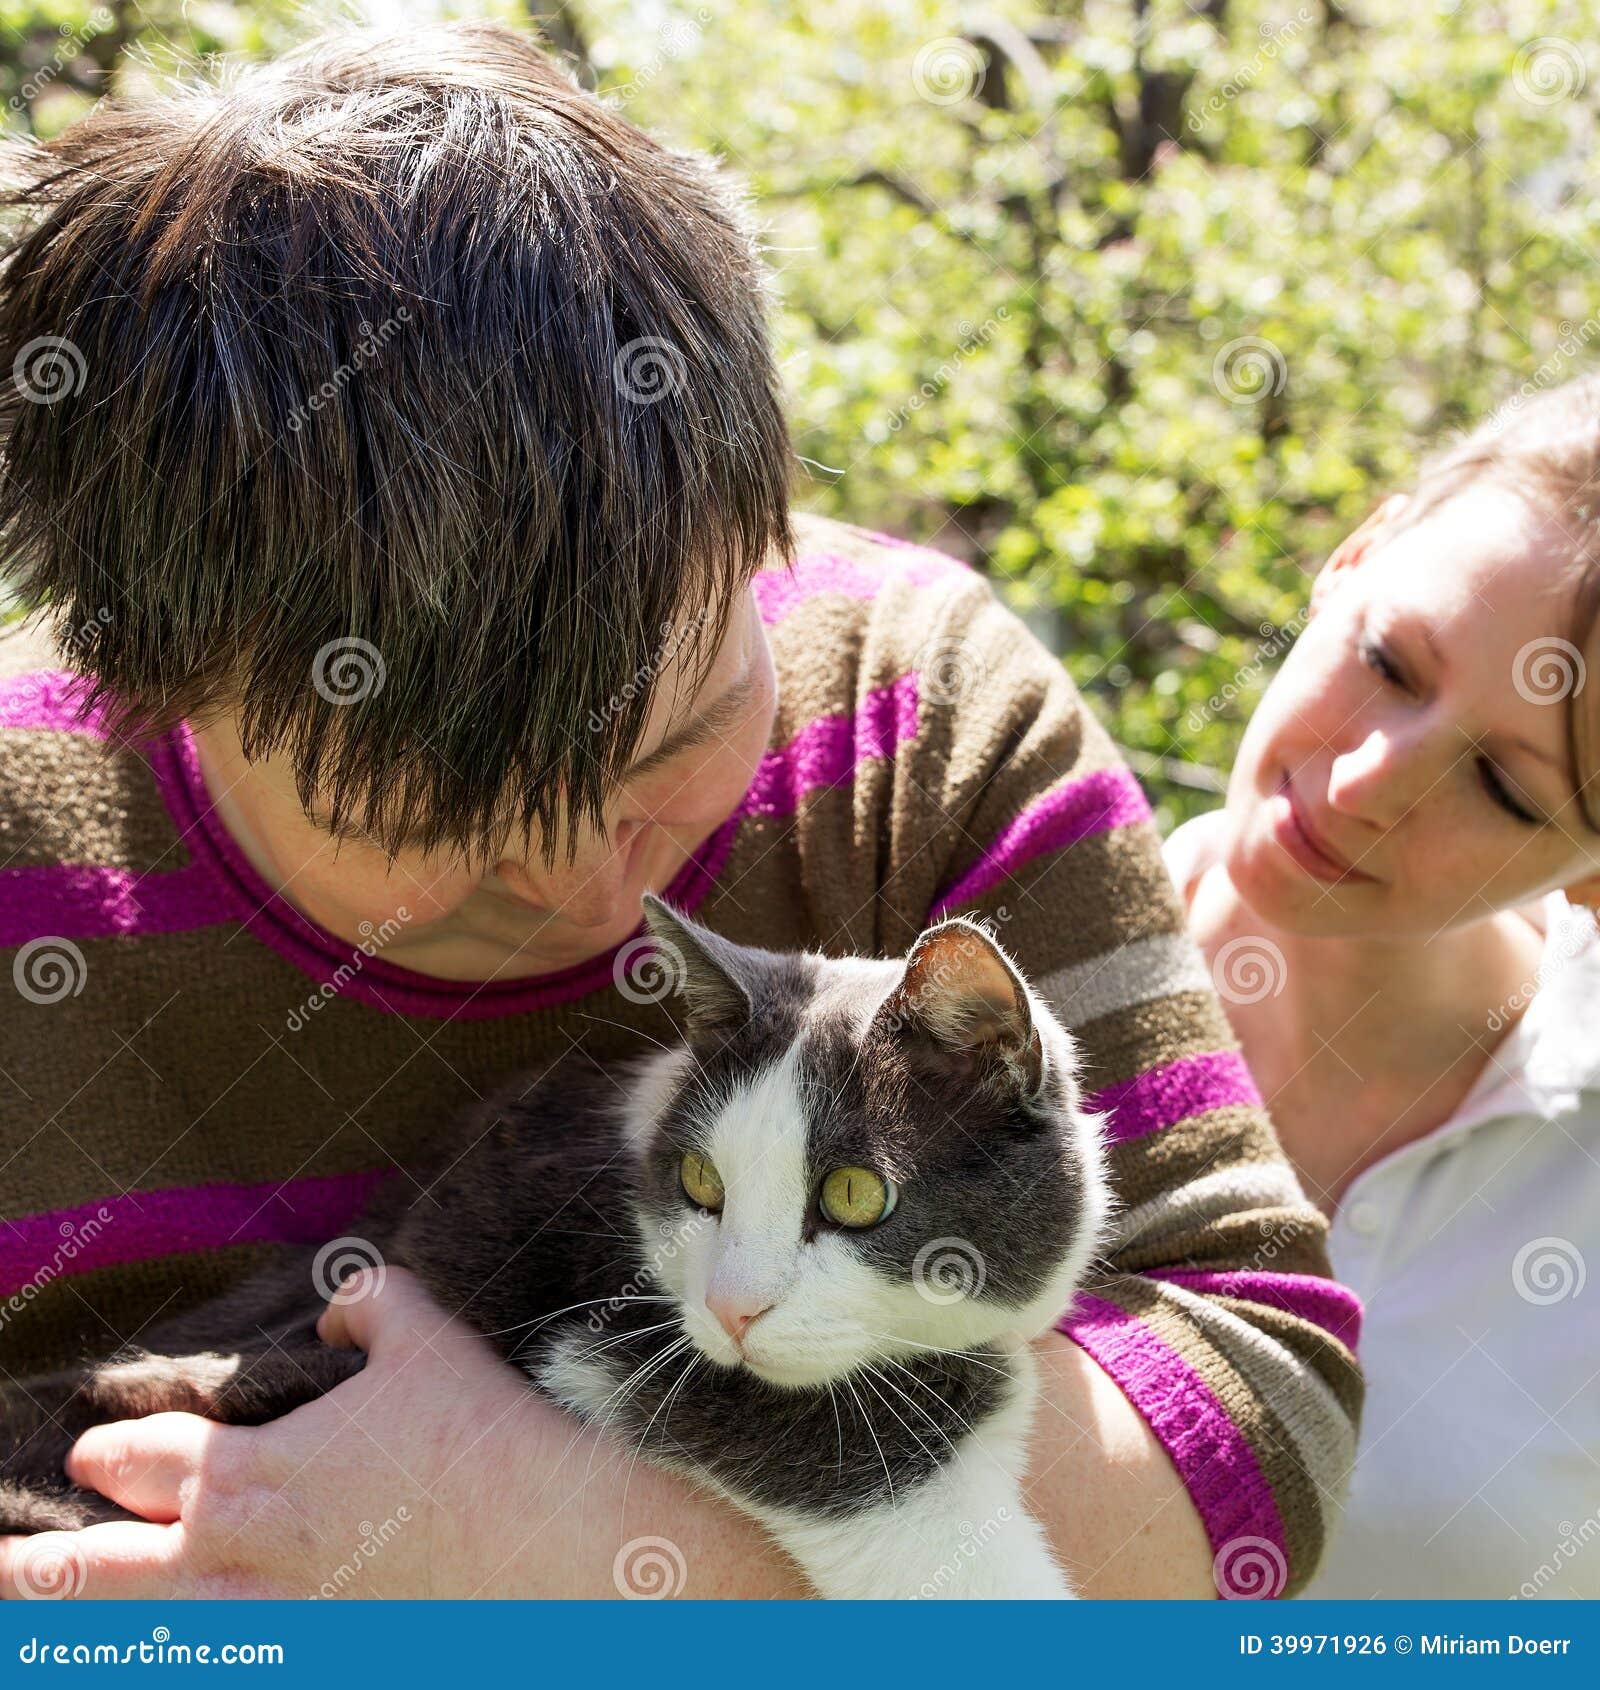 Disabled woman cuddles a cat